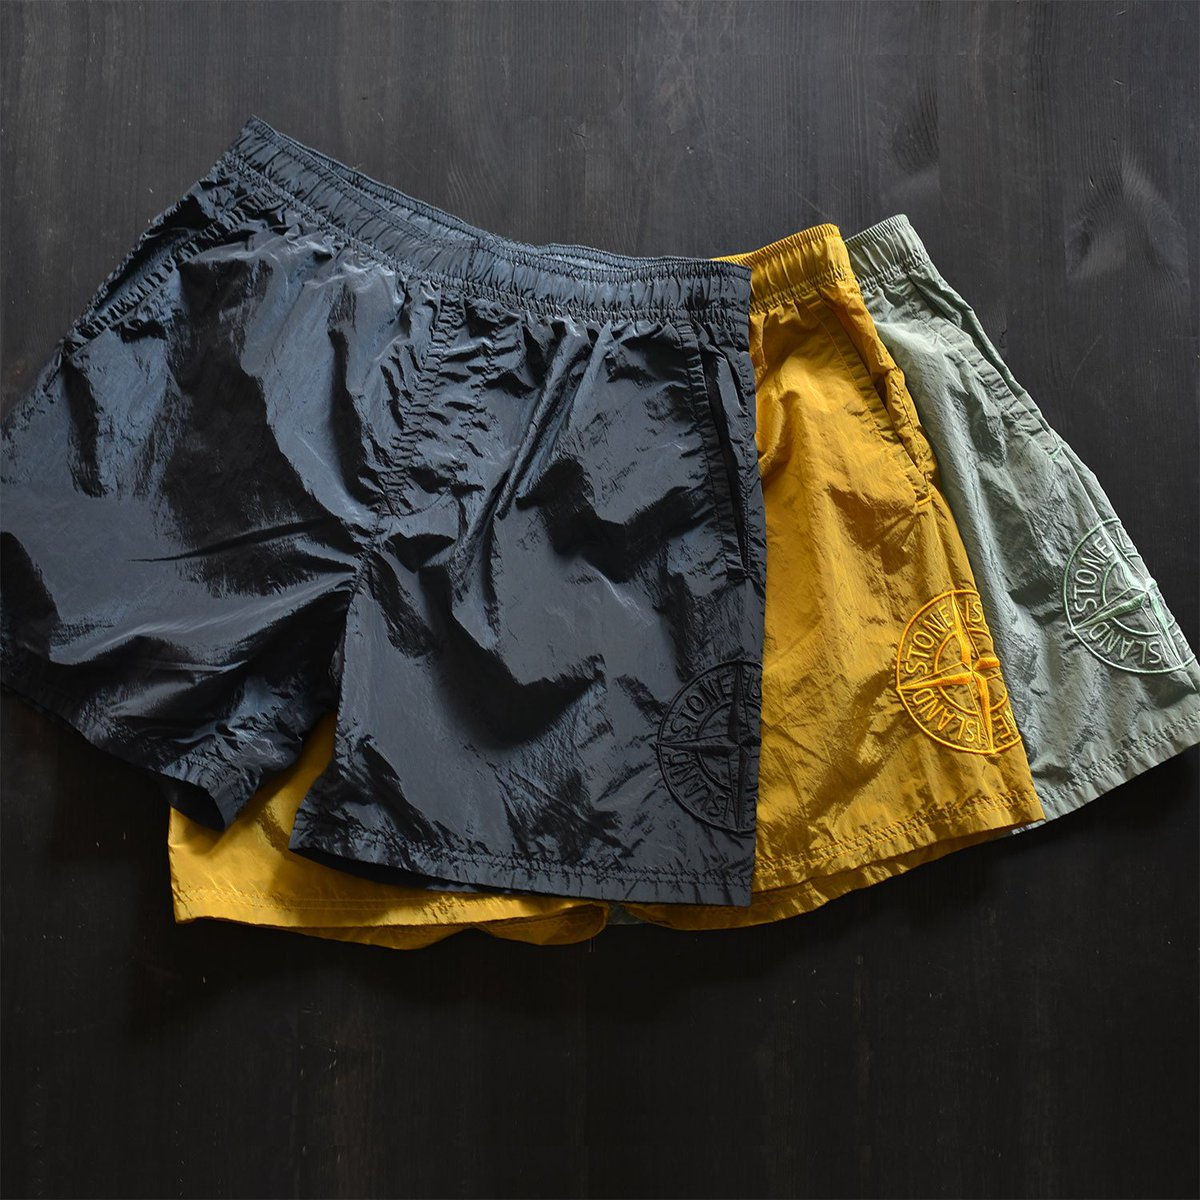 2efc423d57 Stone Island Nylon Logo Swim Shorts featuring tonal logo embroidery,  elasticated drawstring waist, mesh lining, 2 side pockets and back pocket  with zip ...